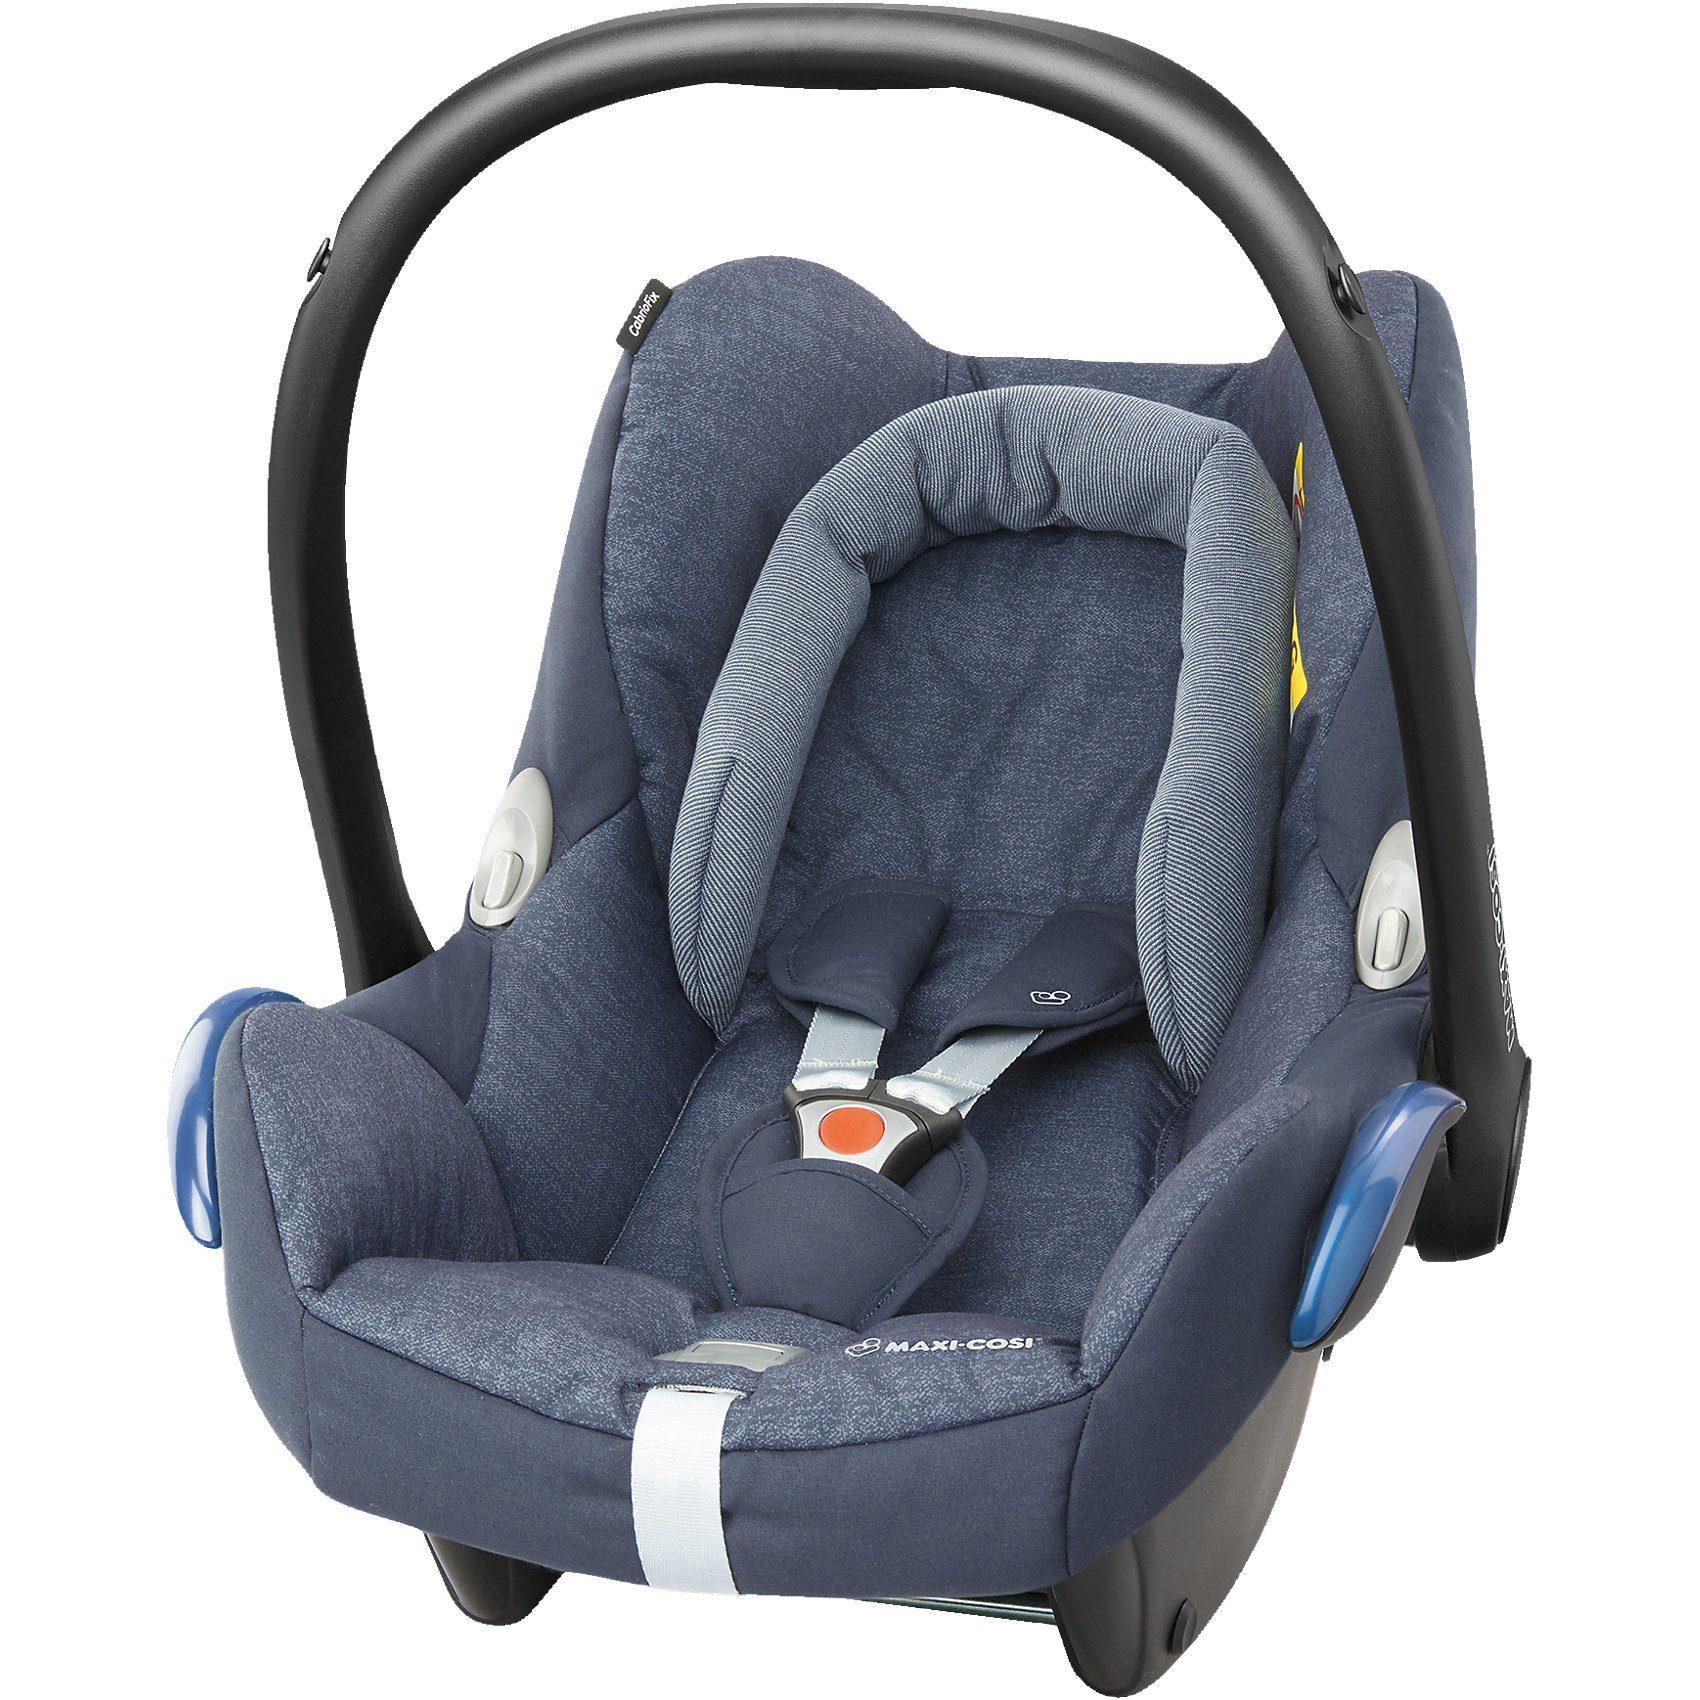 Maxi-Cosi Babyschale Cabriofix, Nomad Blue, 2017